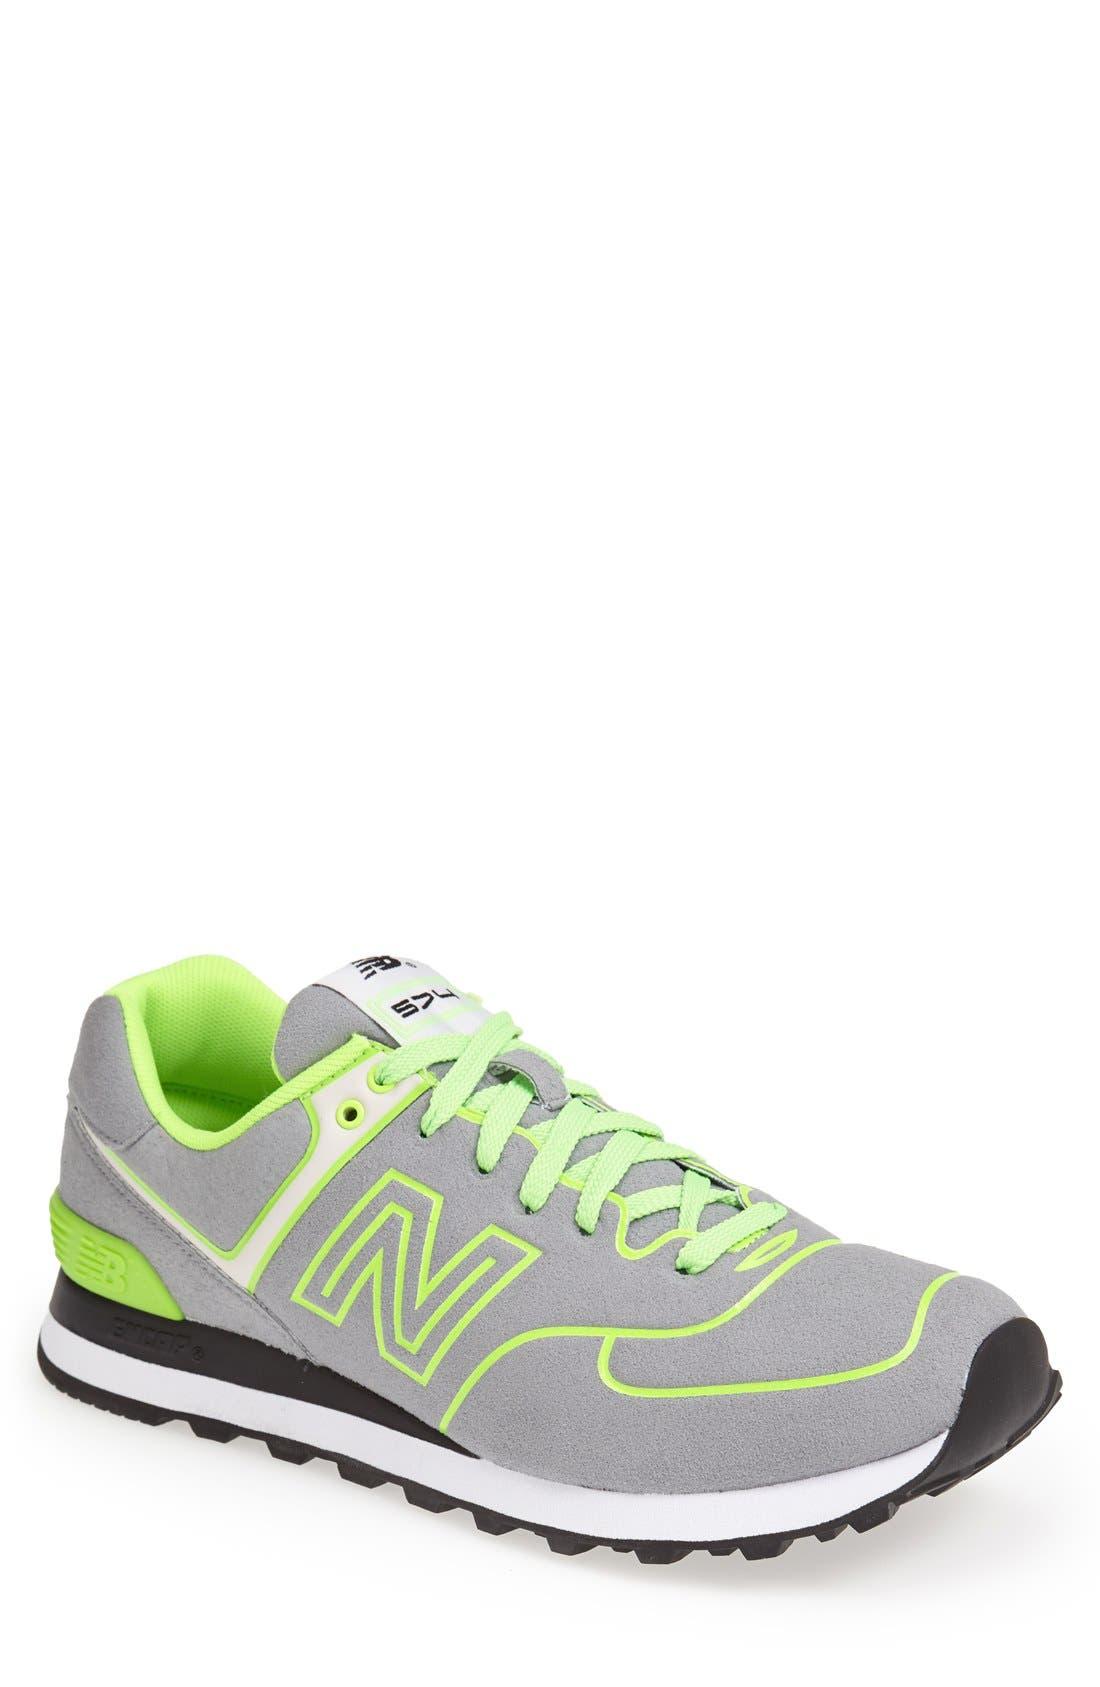 Alternate Image 1 Selected - New Balance '574 Neon' Sneaker (Men)